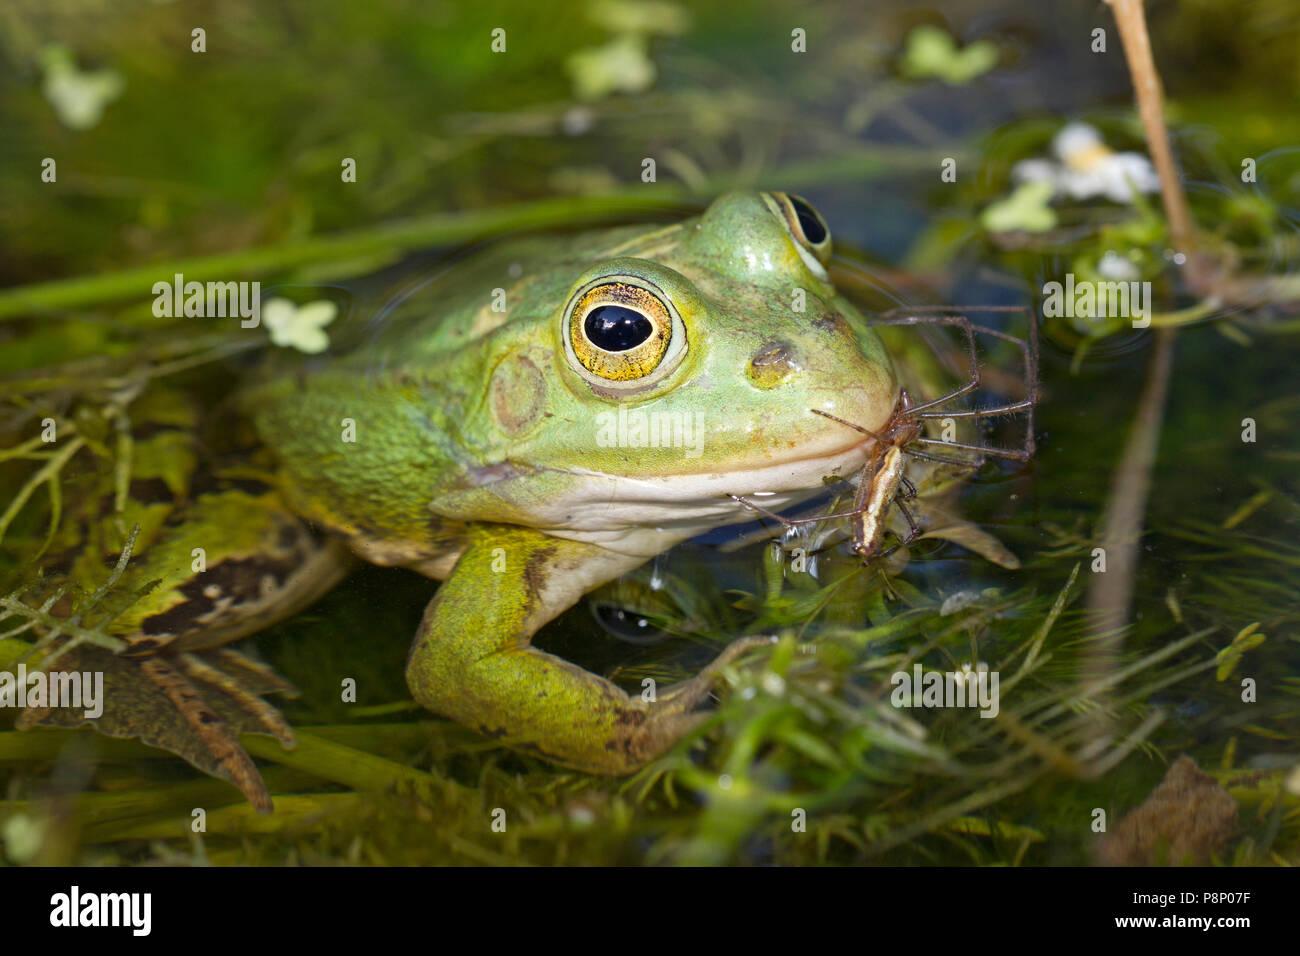 Pool-Frosch im Wasser Stockbild